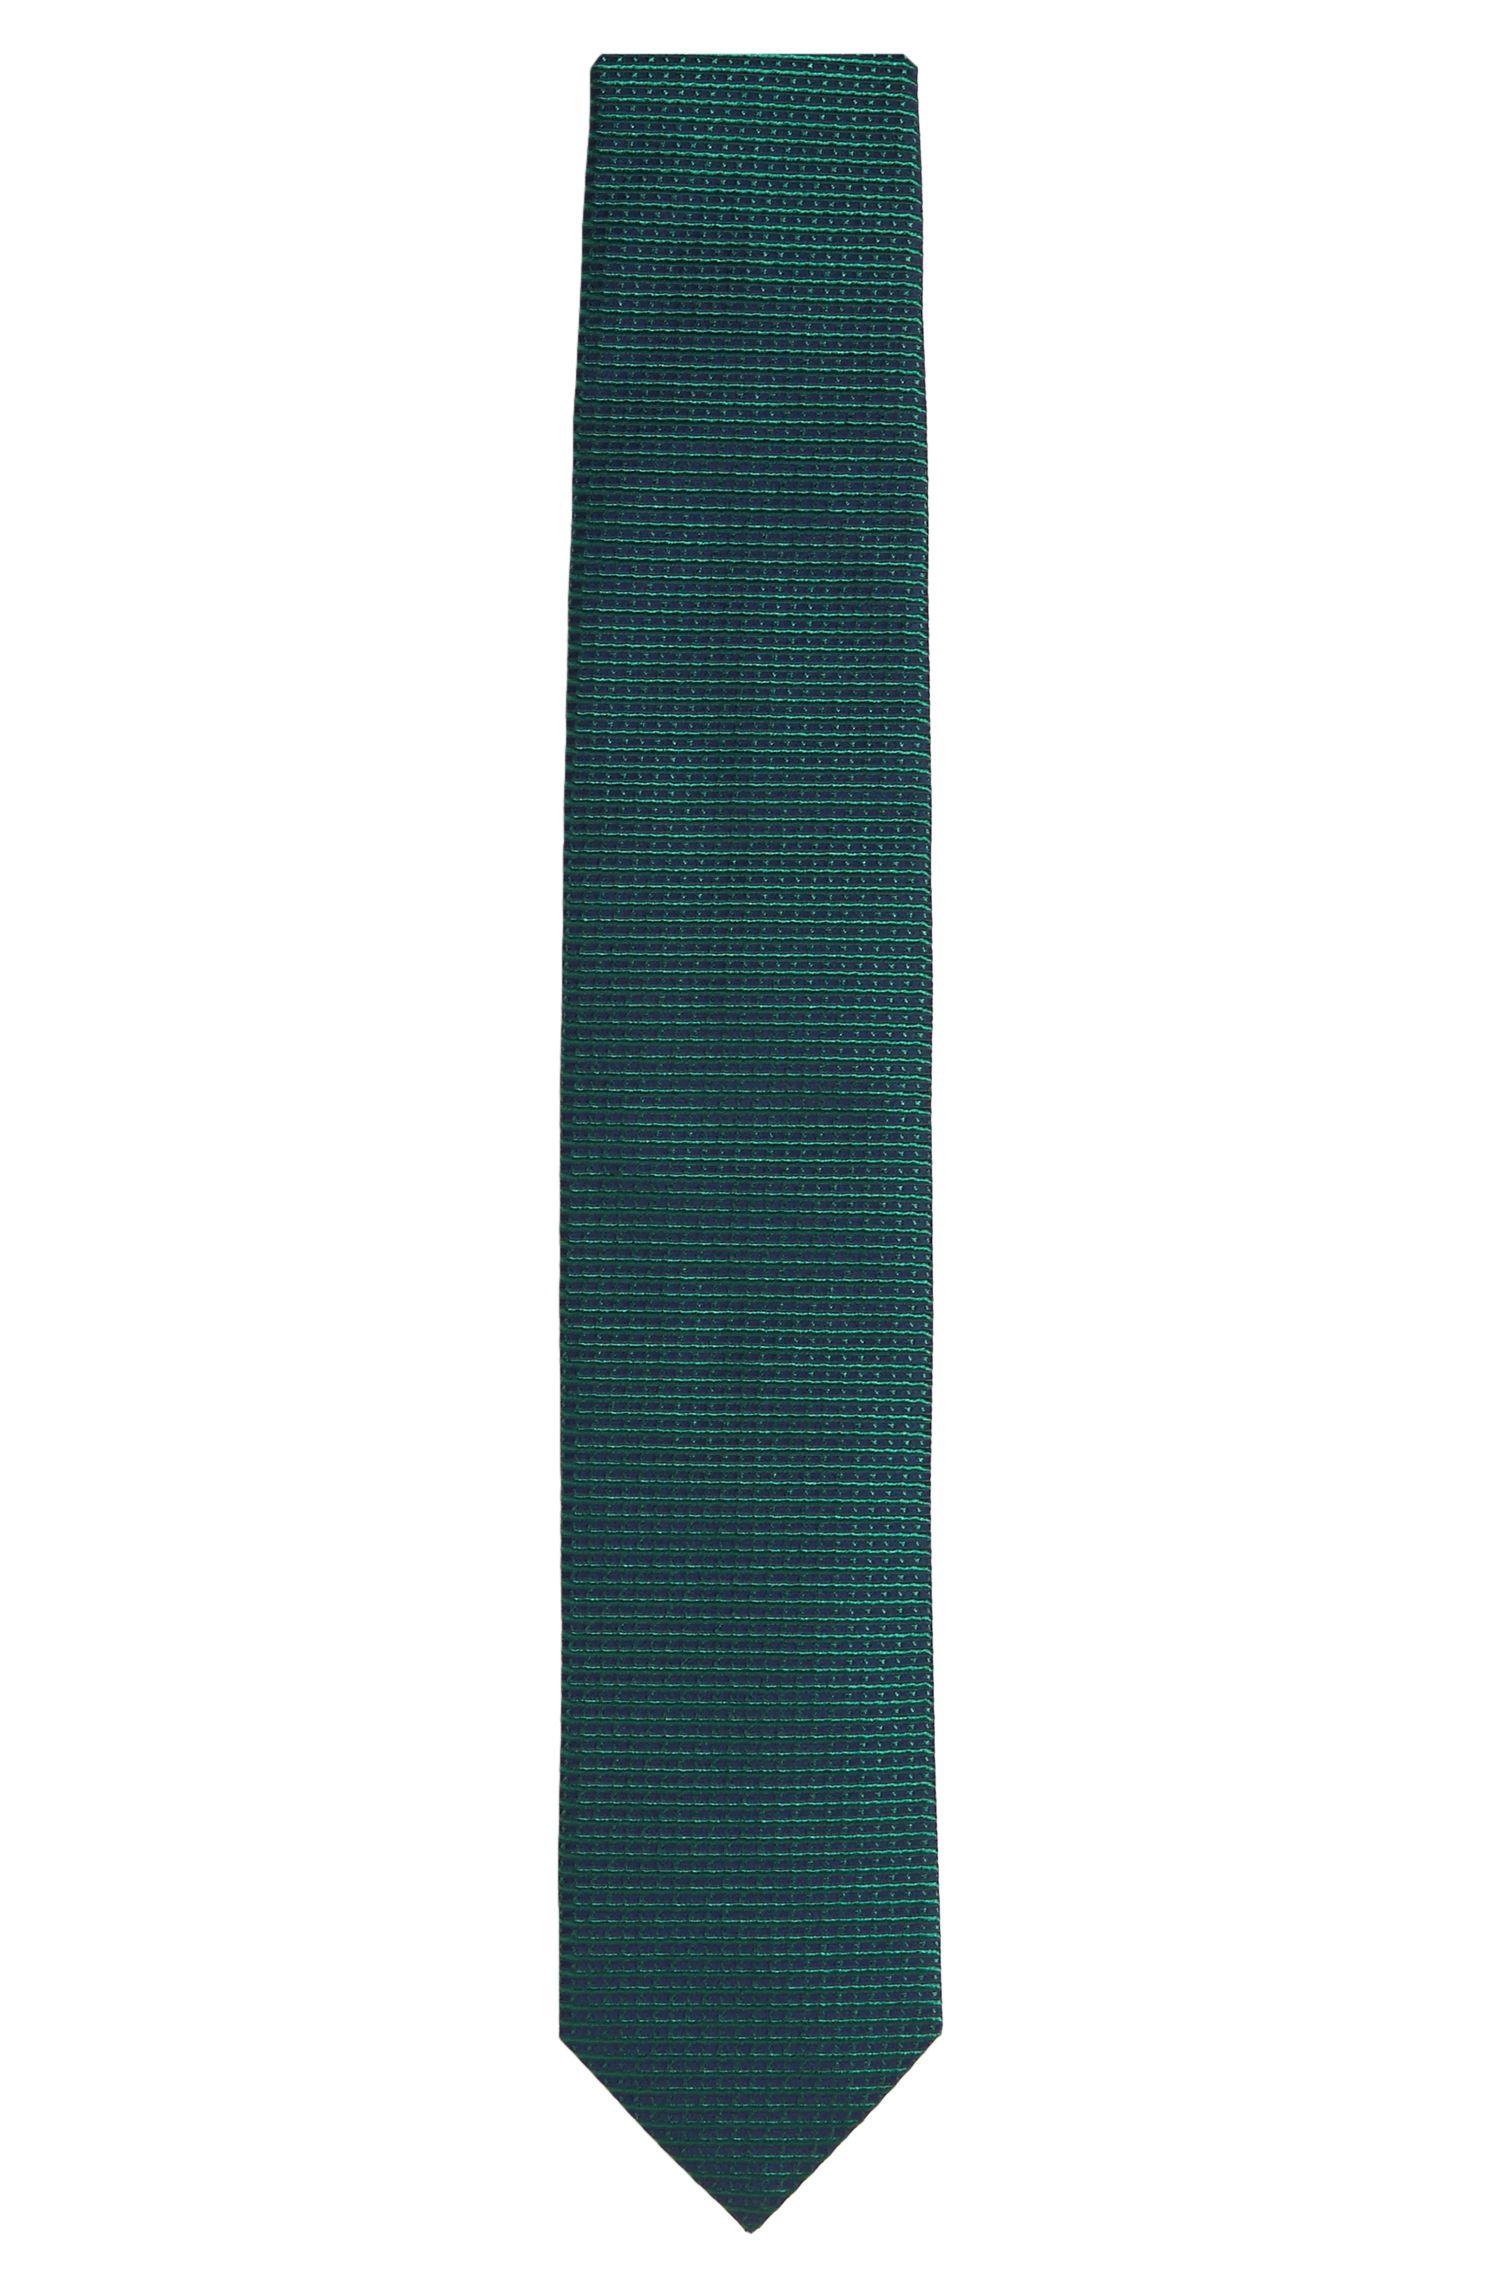 'Tie 7 cm' | Regular, Italian Silk Embroidered Tie, Green